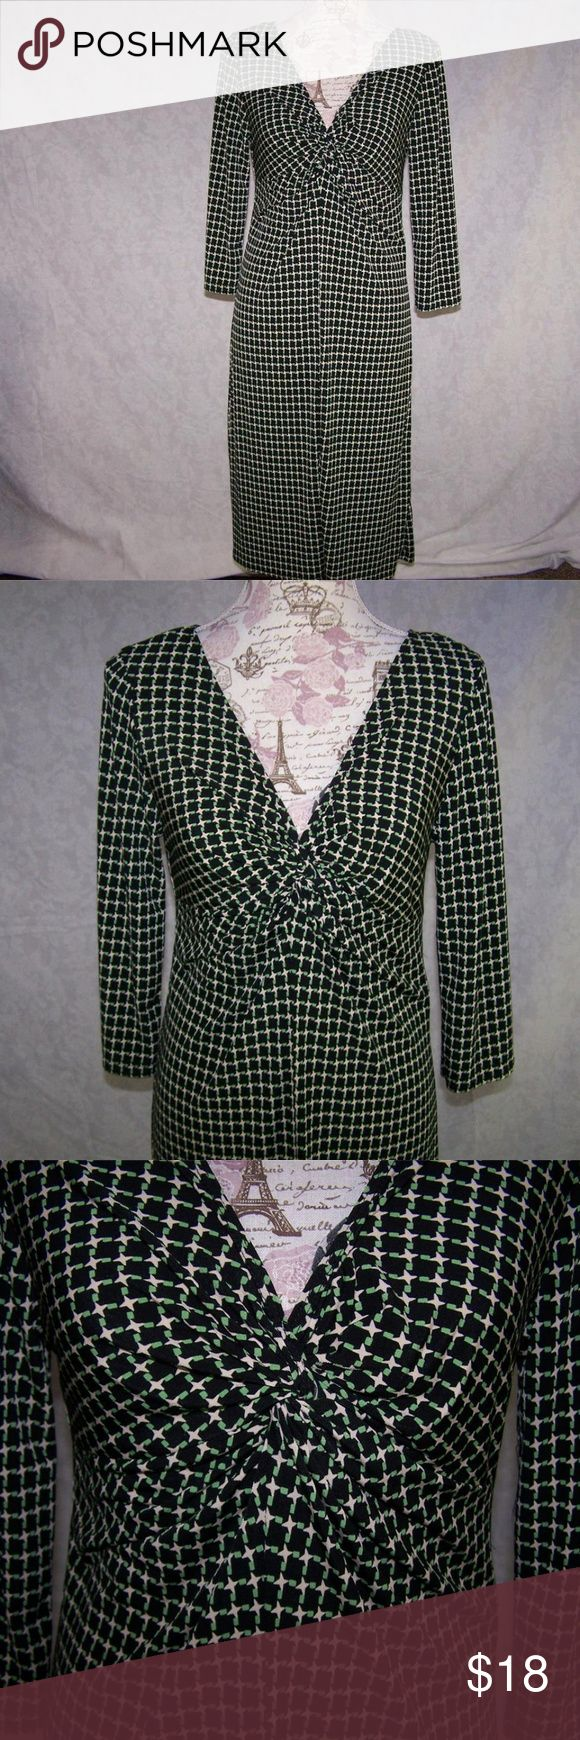 "TIANA B. Dress M Knotted Front V-Neck Stretch Tiana B. size medium dress knotted front 3/4 sleeves front & back v-neck stretchy  95%  polyester  5%  spandex hand wash  bust  32"" waist  30"" hip  38"" length  41"" sleeve length  17 1/2""  very nice Tiana B. Dresses"